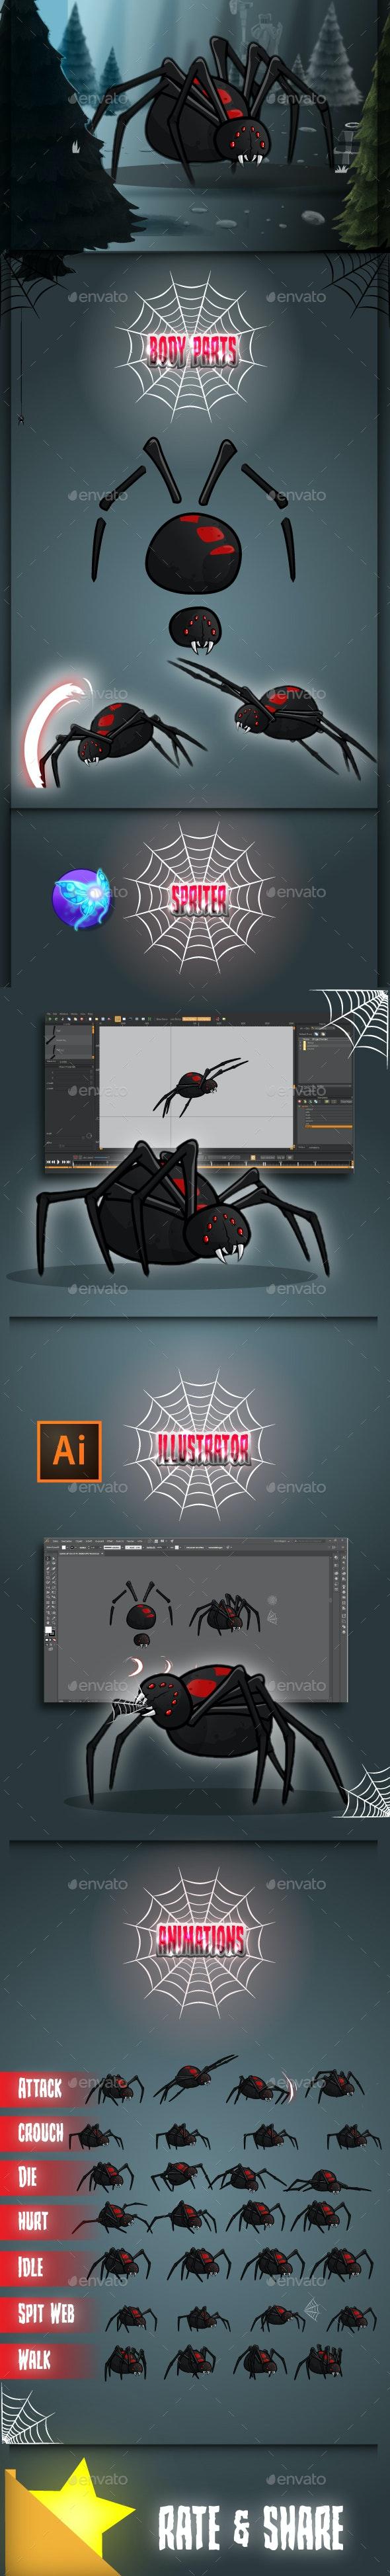 Giant Black Widow Spider Game Sprites - Sprites Game Assets